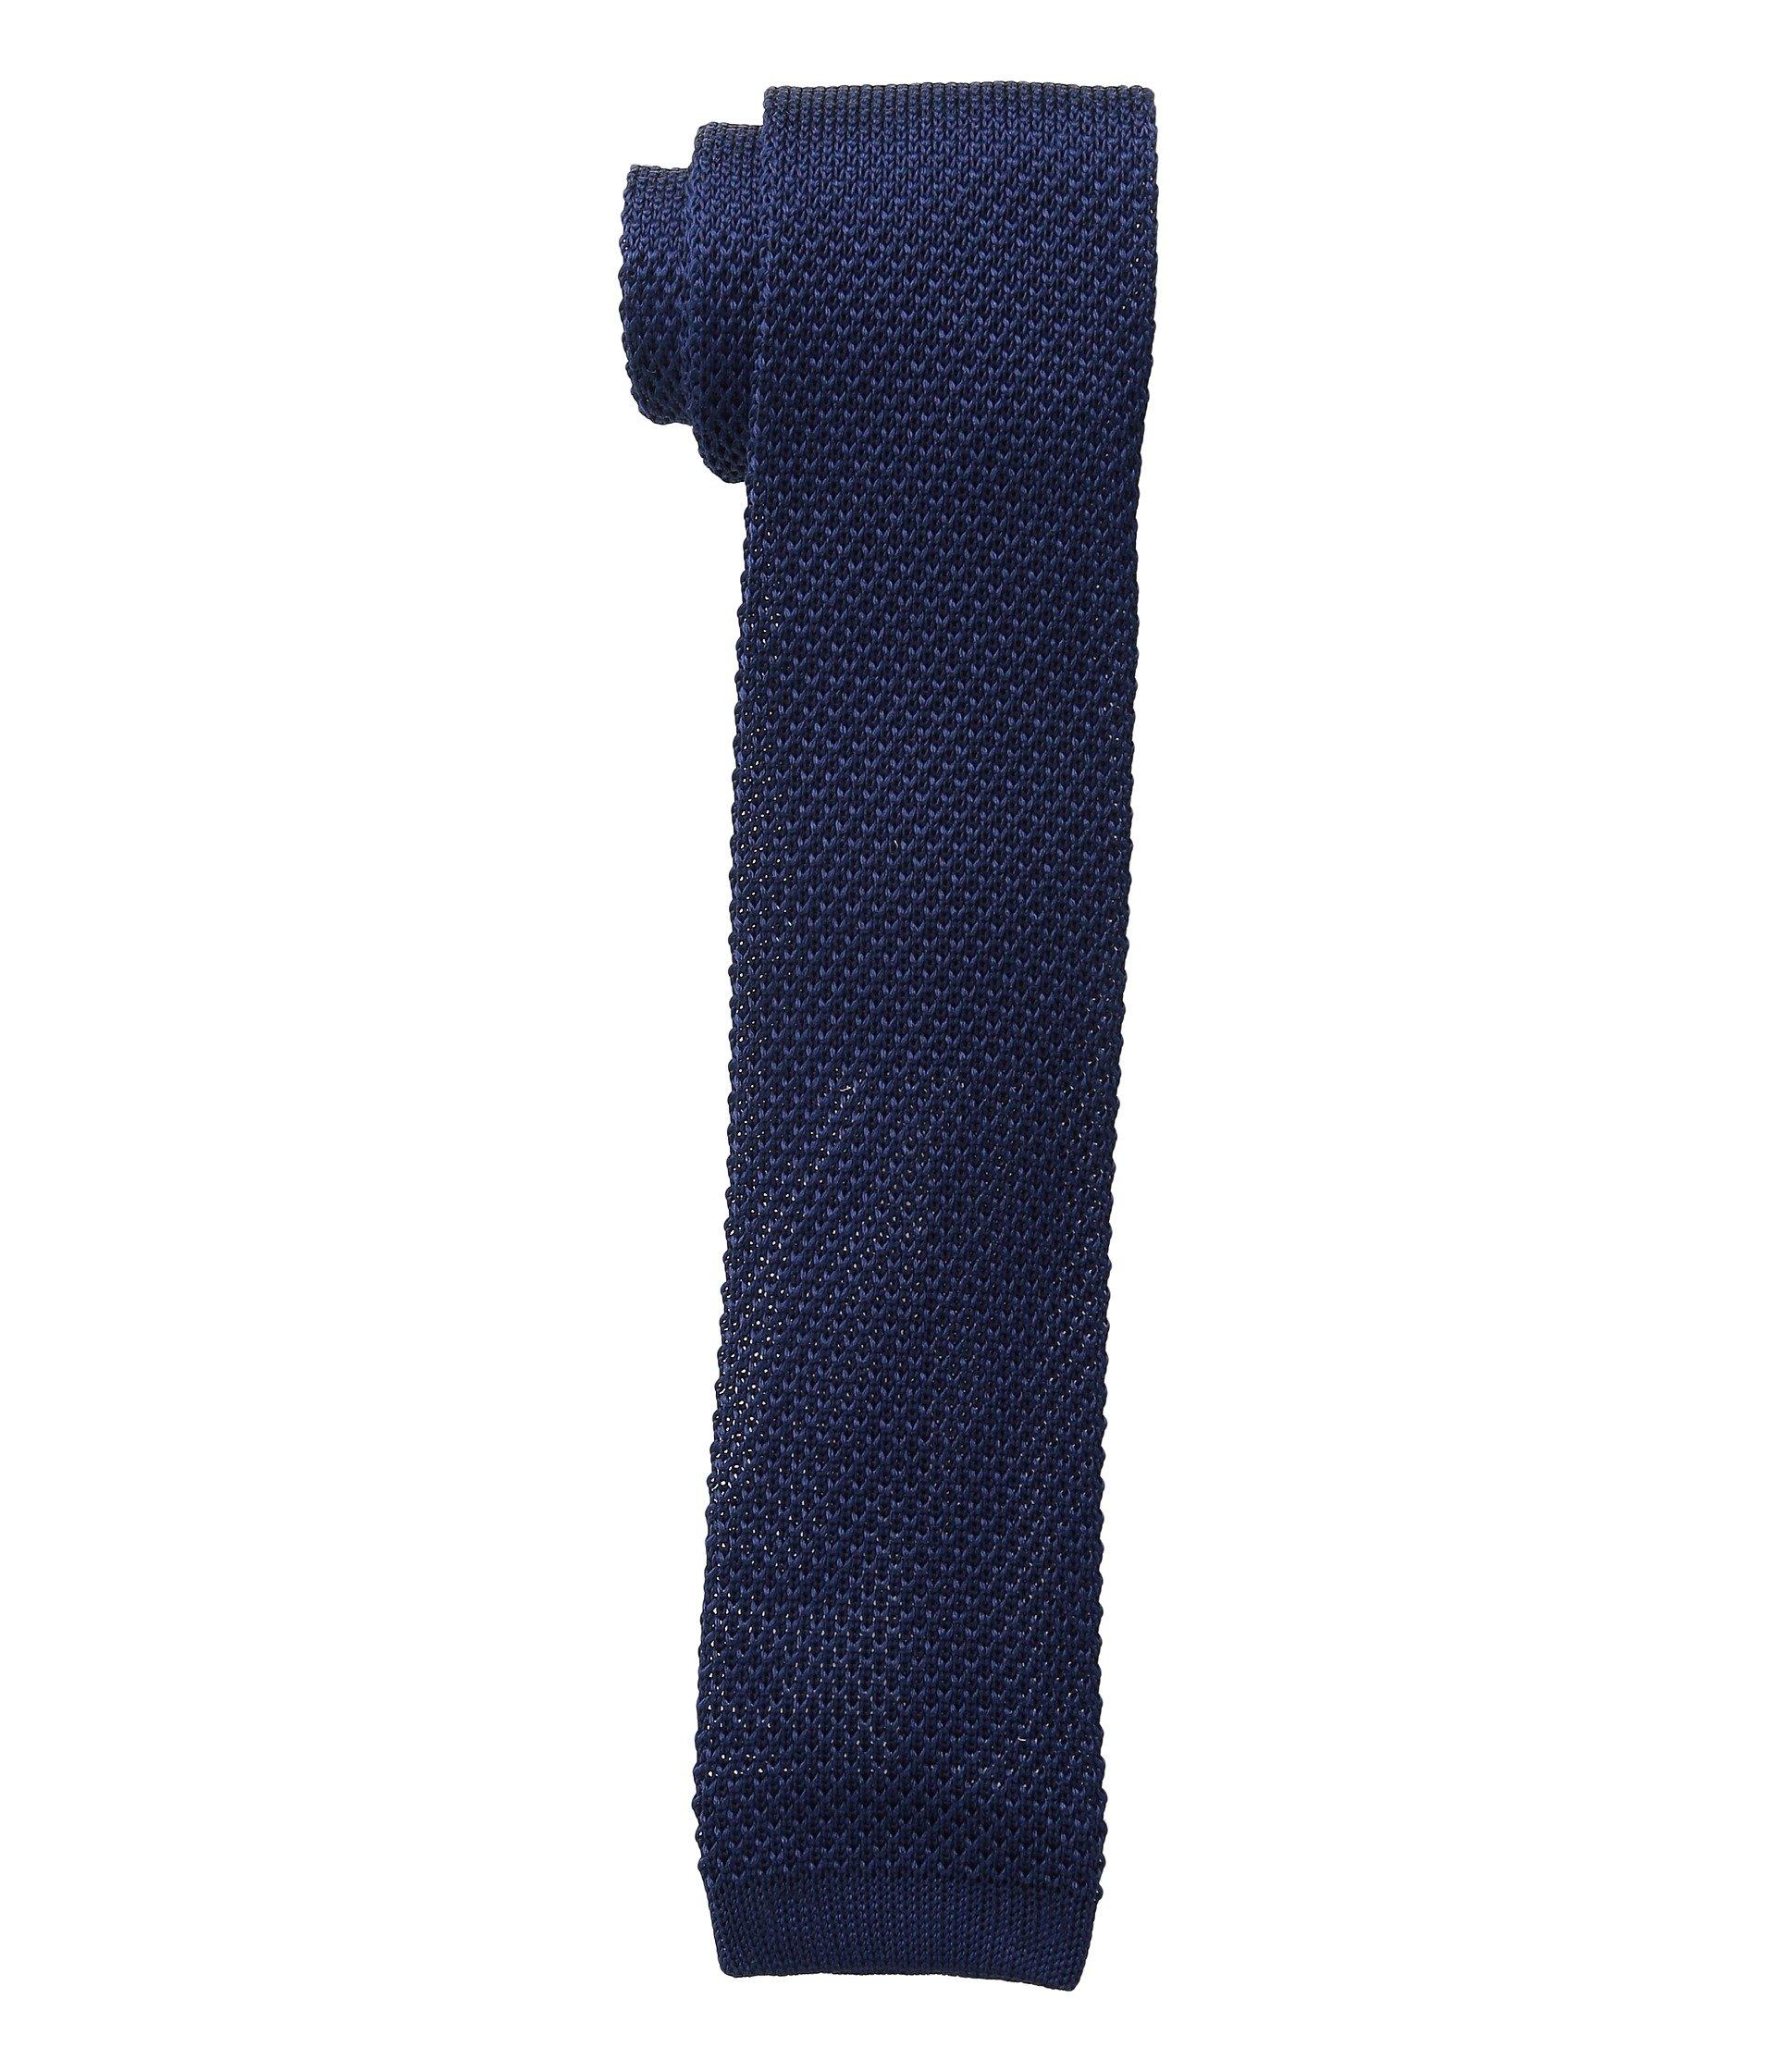 Corbata para Hombre Tommy Hilfiger Knit Solid  + Tommy Hilfiger en VeoyCompro.net